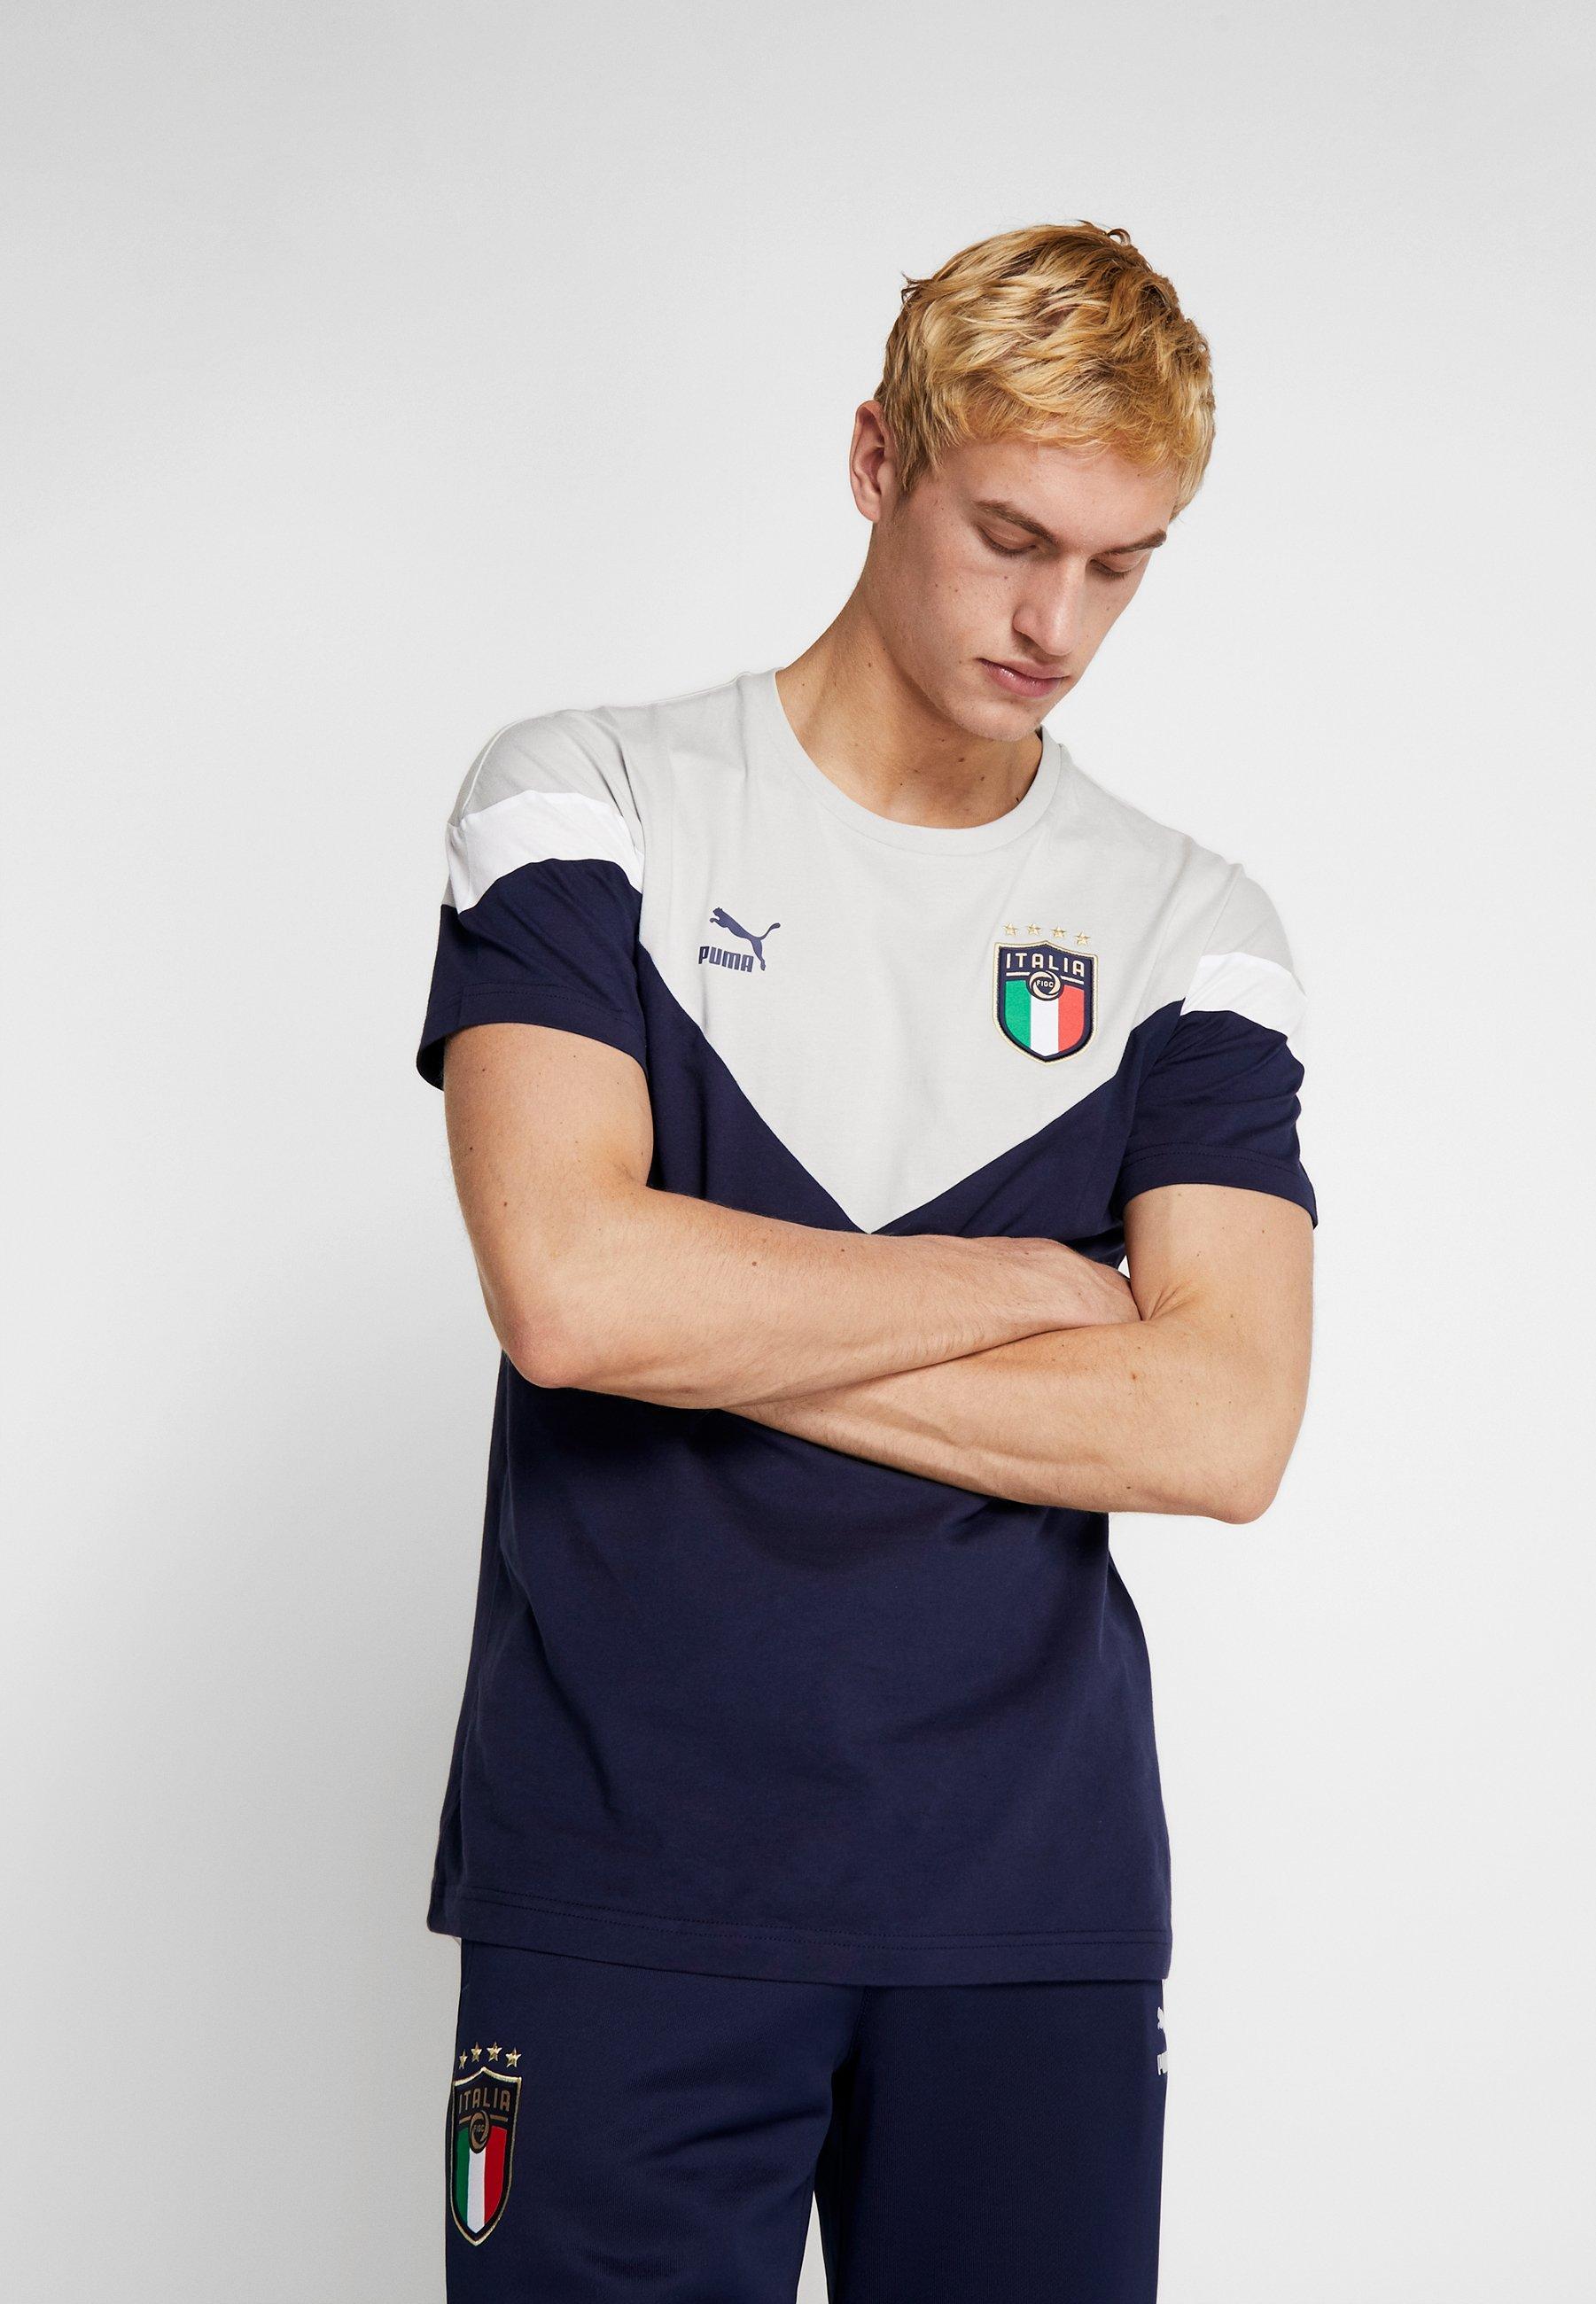 Puma Italien Figc Iconic Mcs Tee - Landsholdstrøjer Peacoat/gray